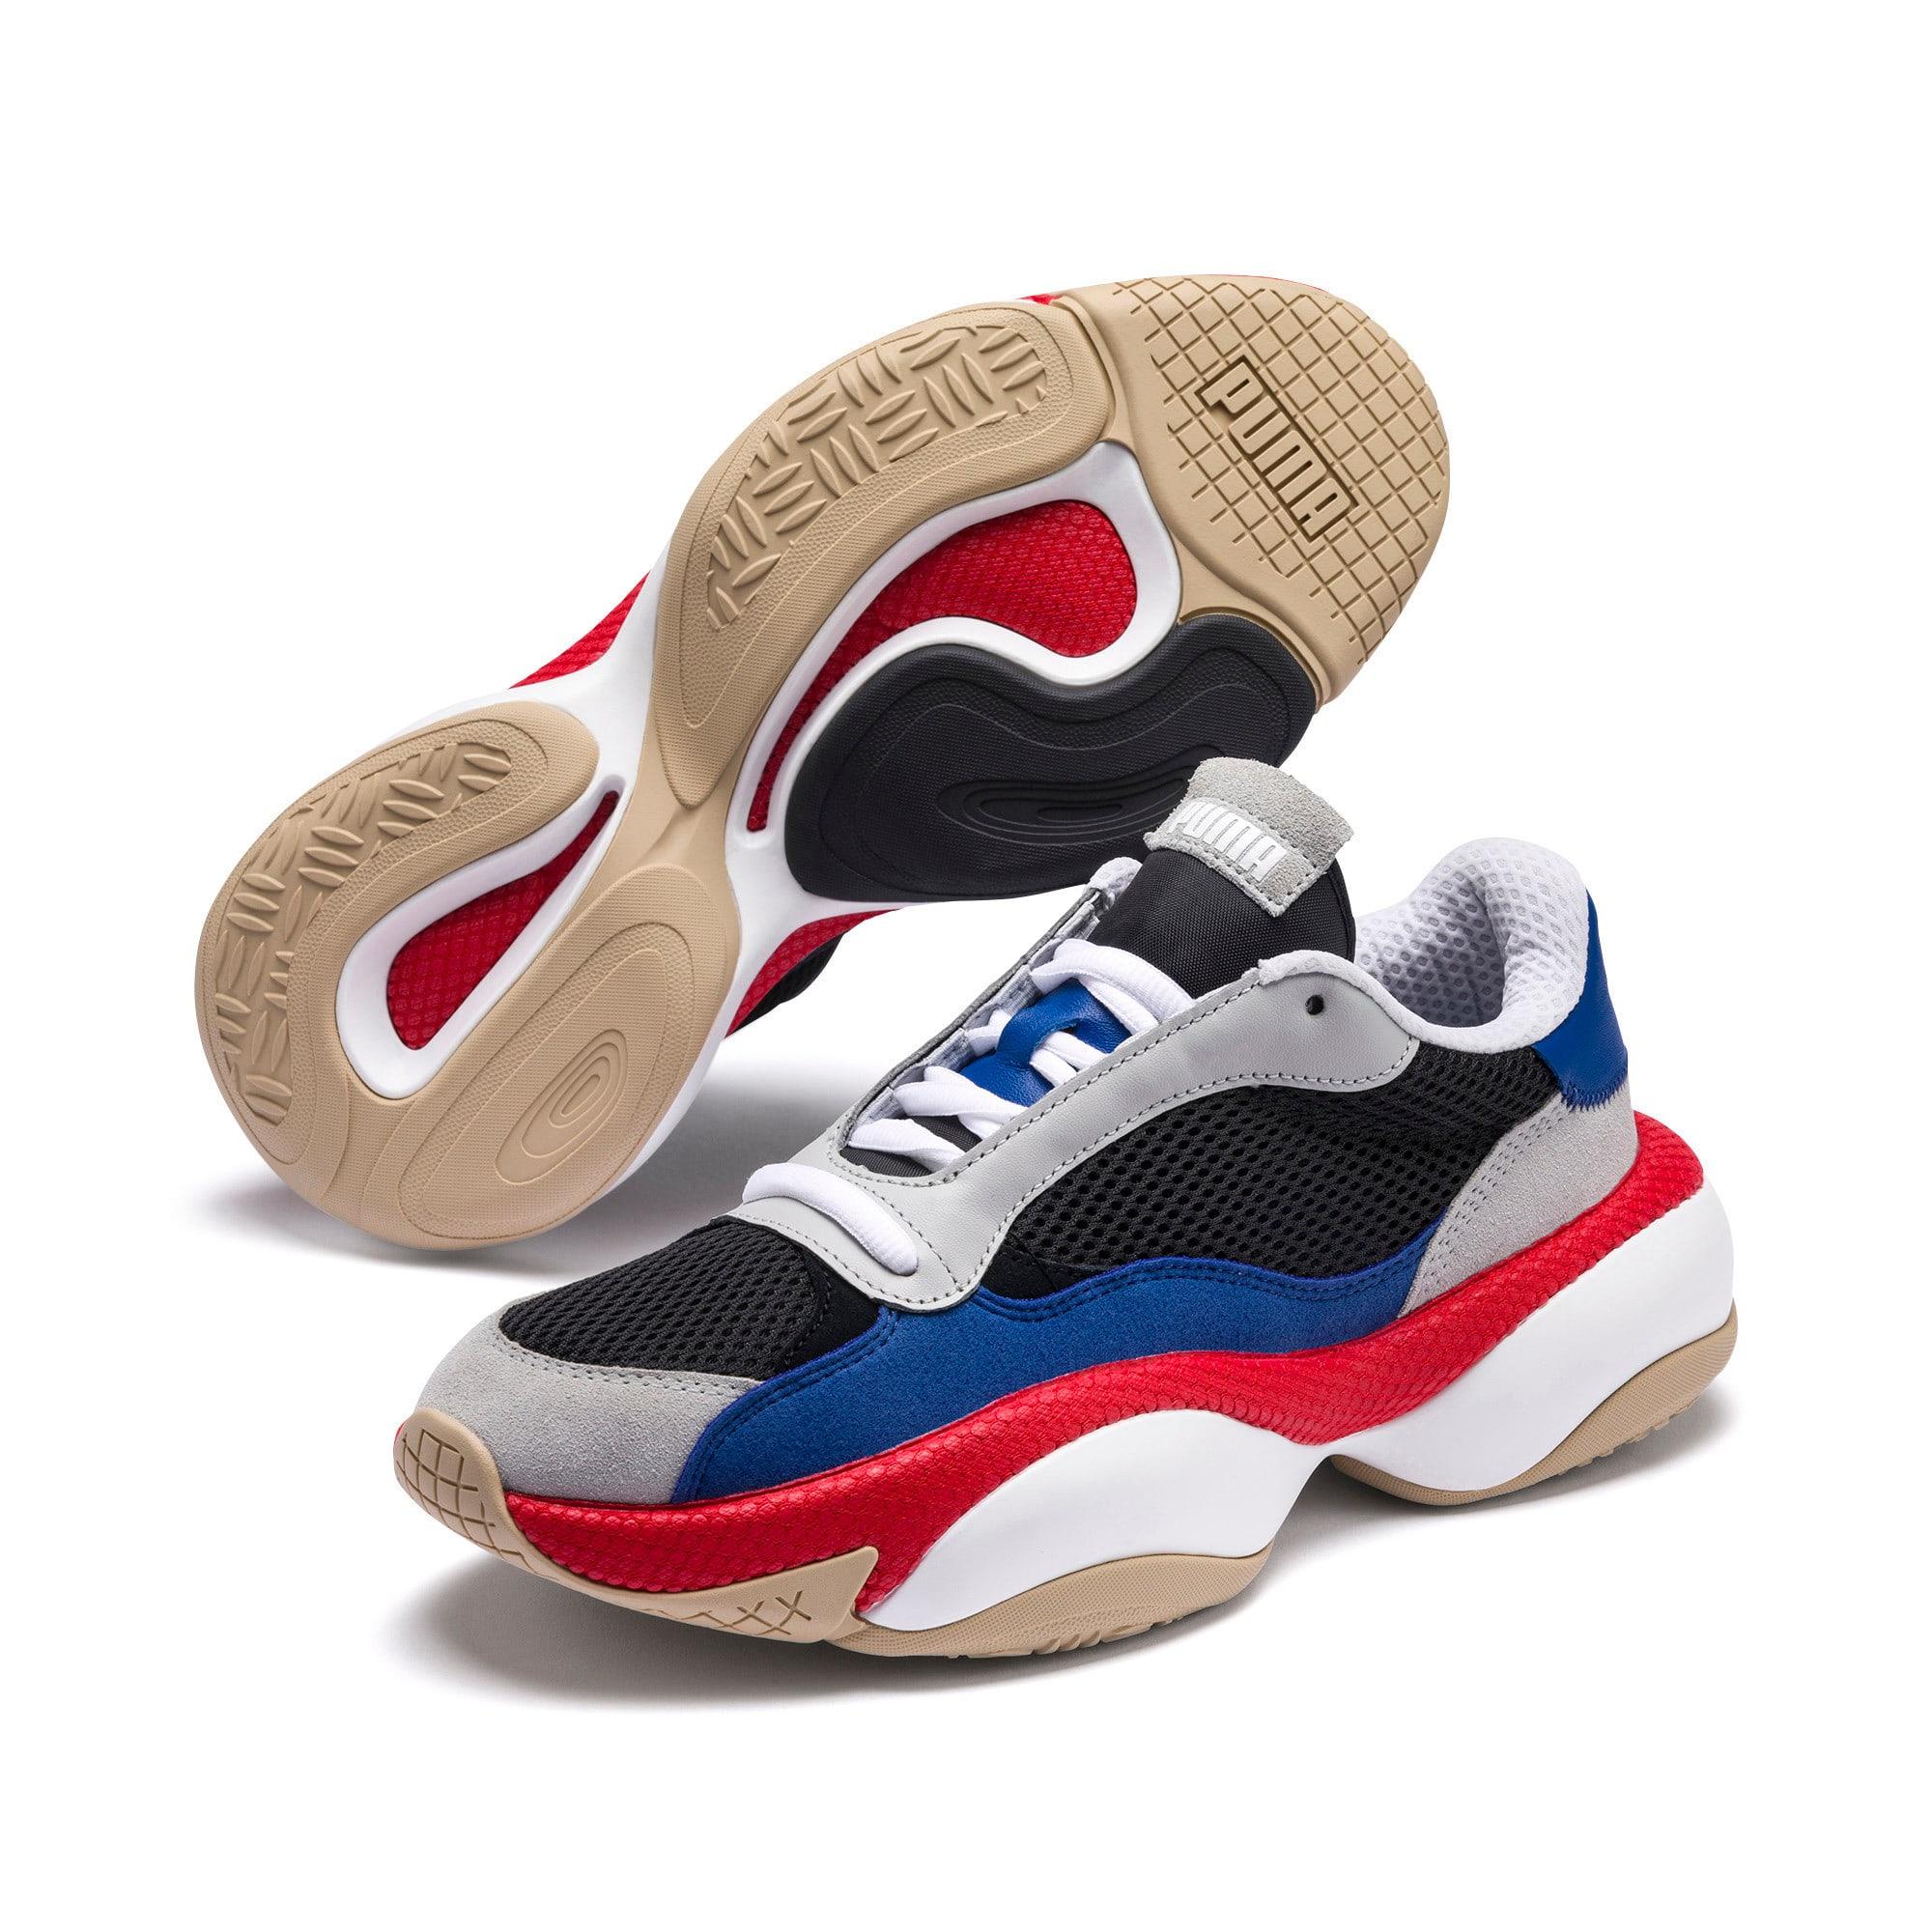 Thumbnail 2 of Alteration Kurve Sneakers, High Rise-Puma Black, medium